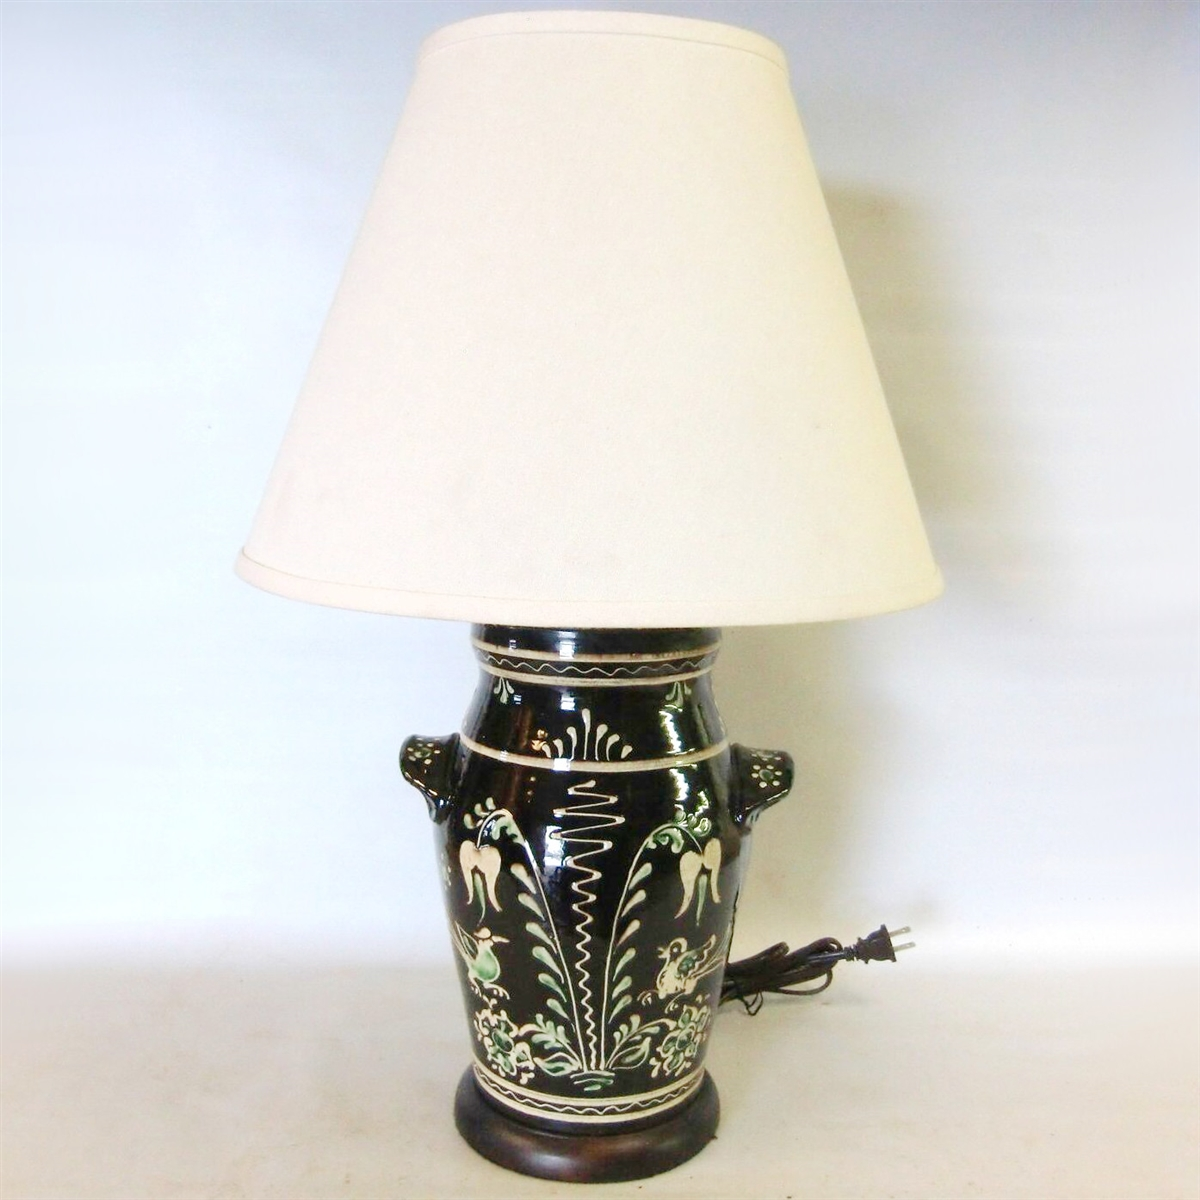 flos stardust light wrong floor spun tulip by sebastian design lamp flosspunfloor